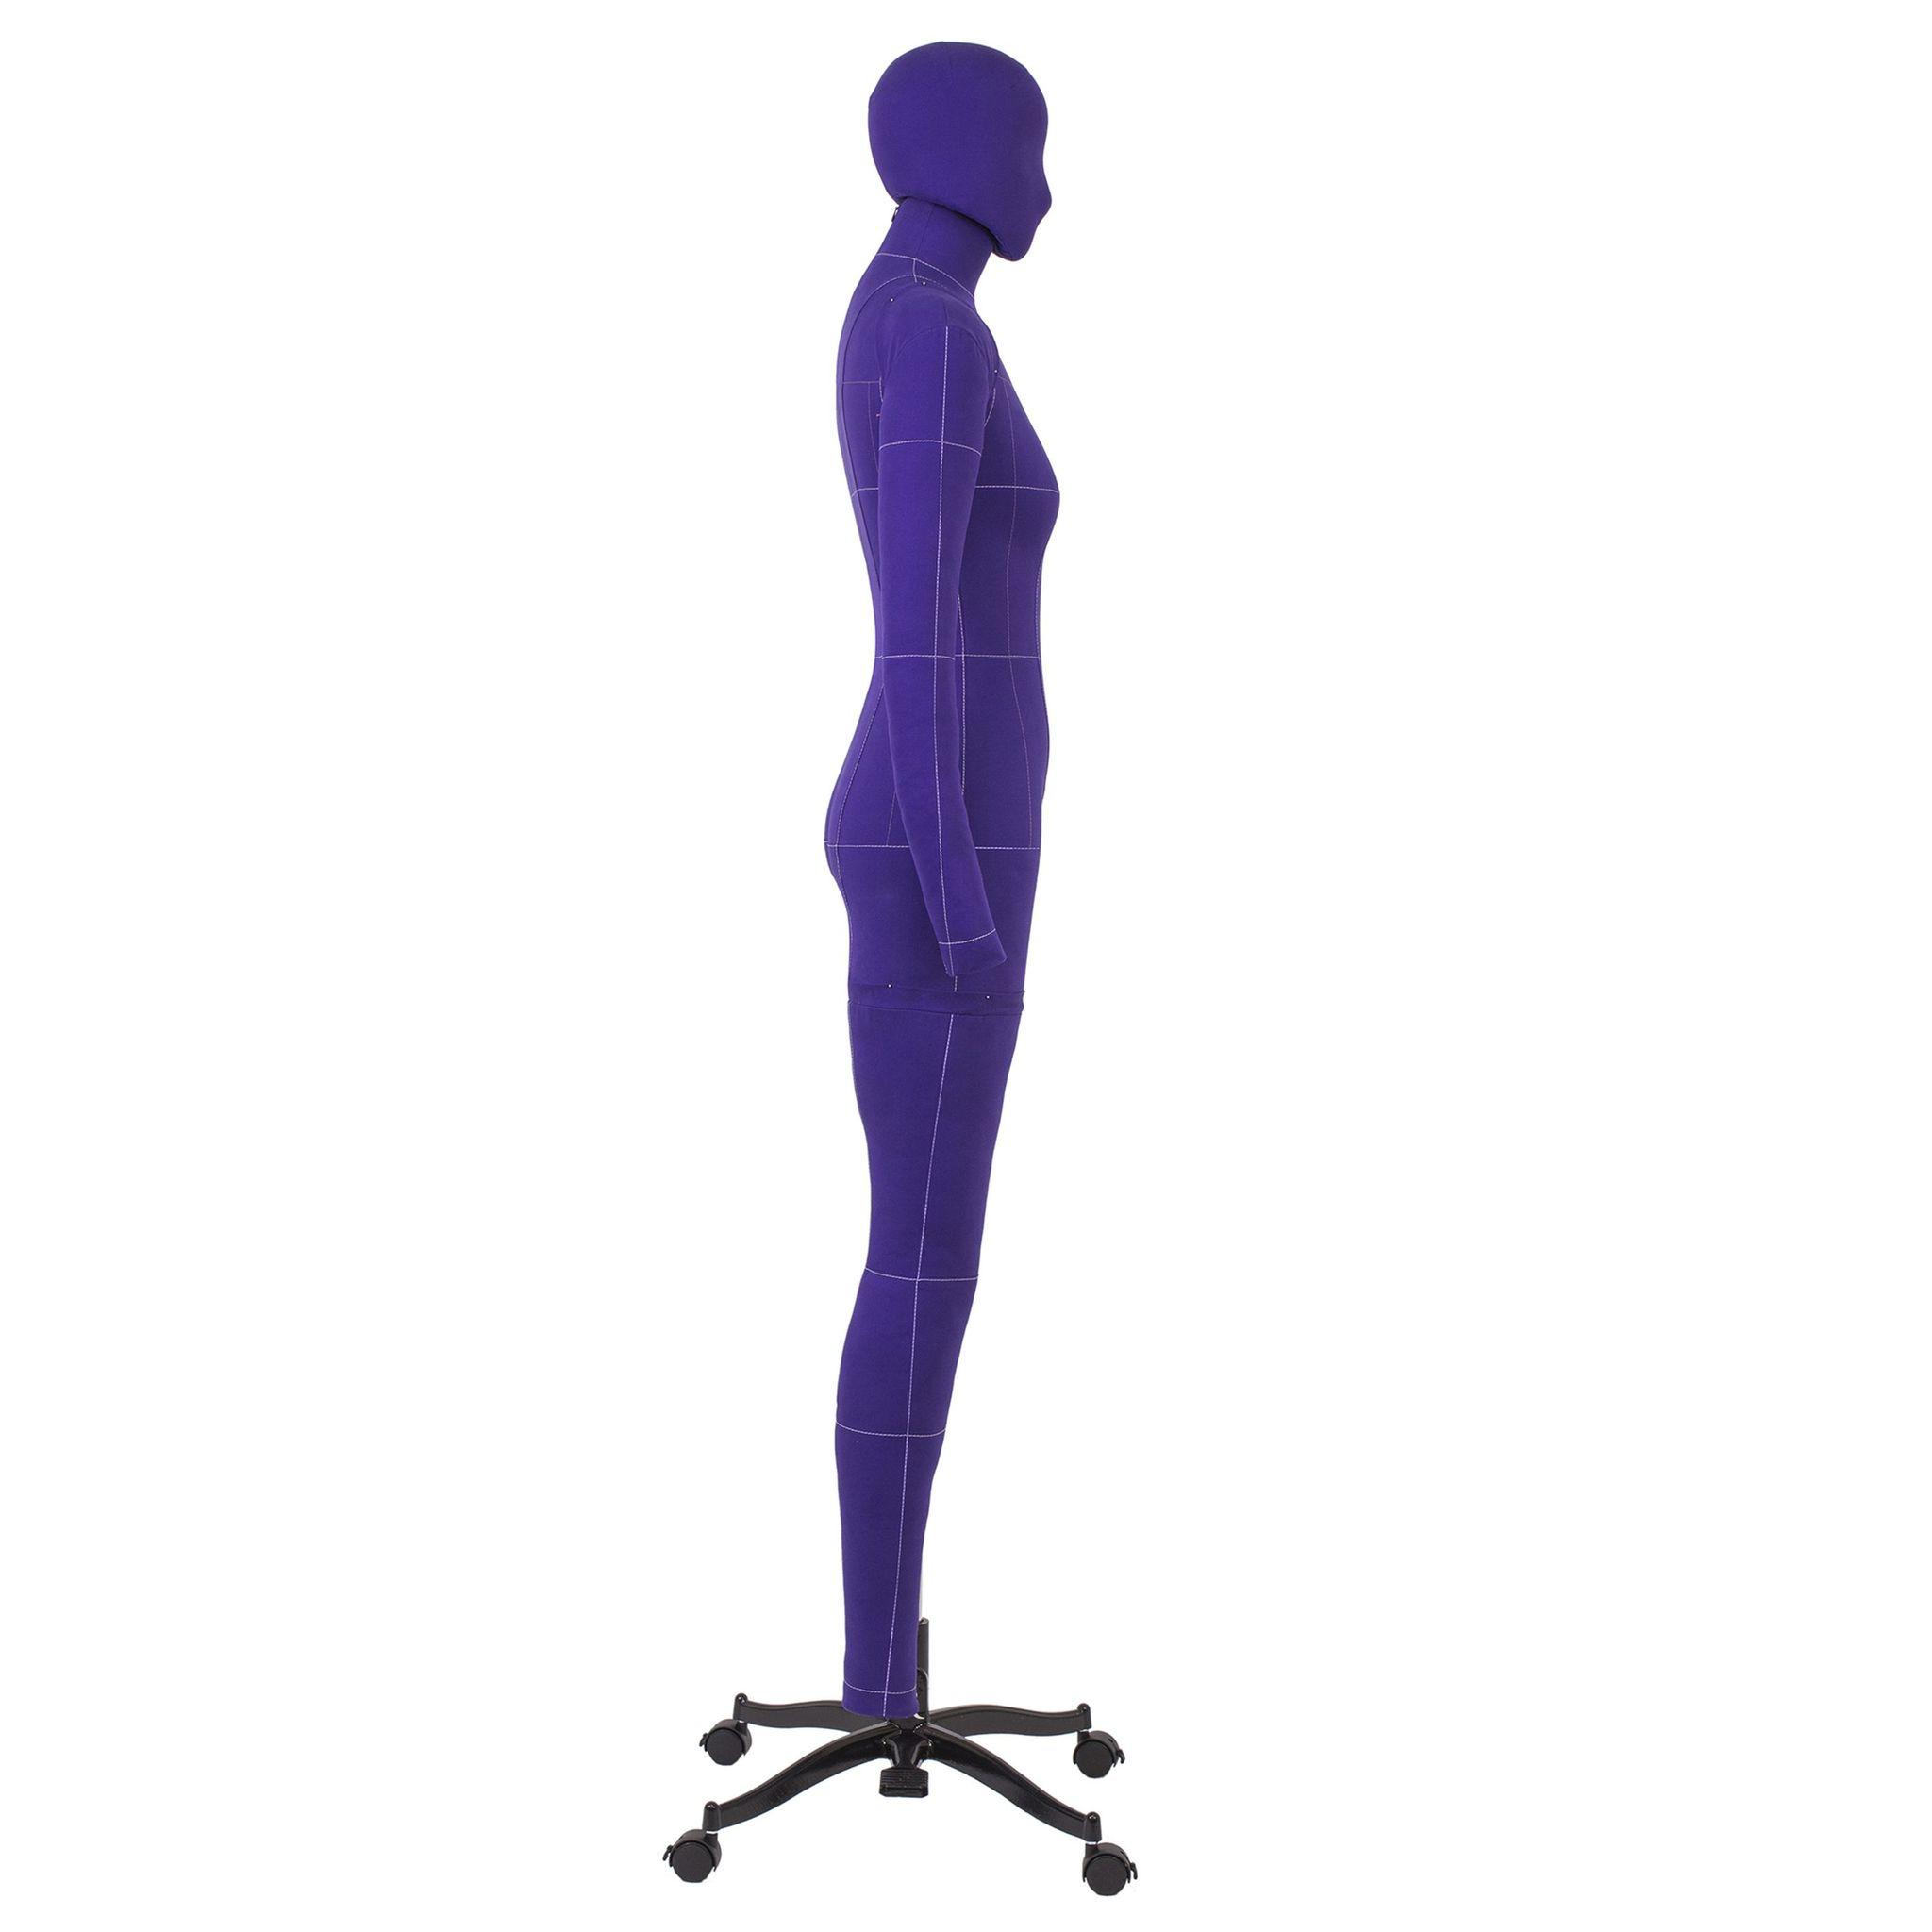 Манекен портновский Моника, комплект Арт, размер 40, ФиолетовыйФото 4